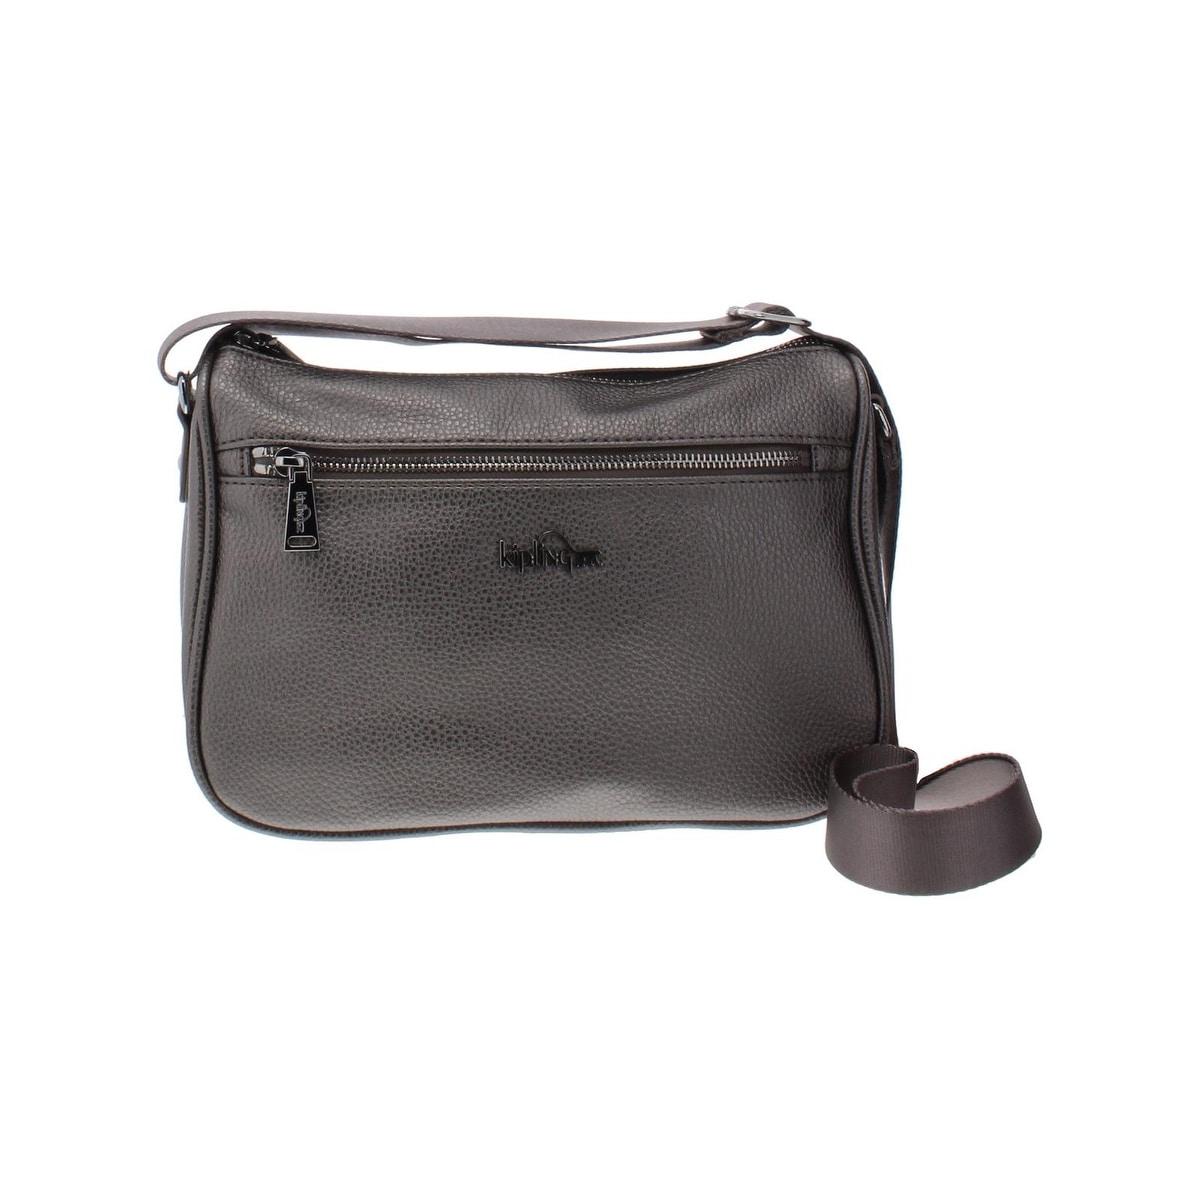 Kipling Womens Callie Crossbody Handbag Faux Leather Shimmer Small